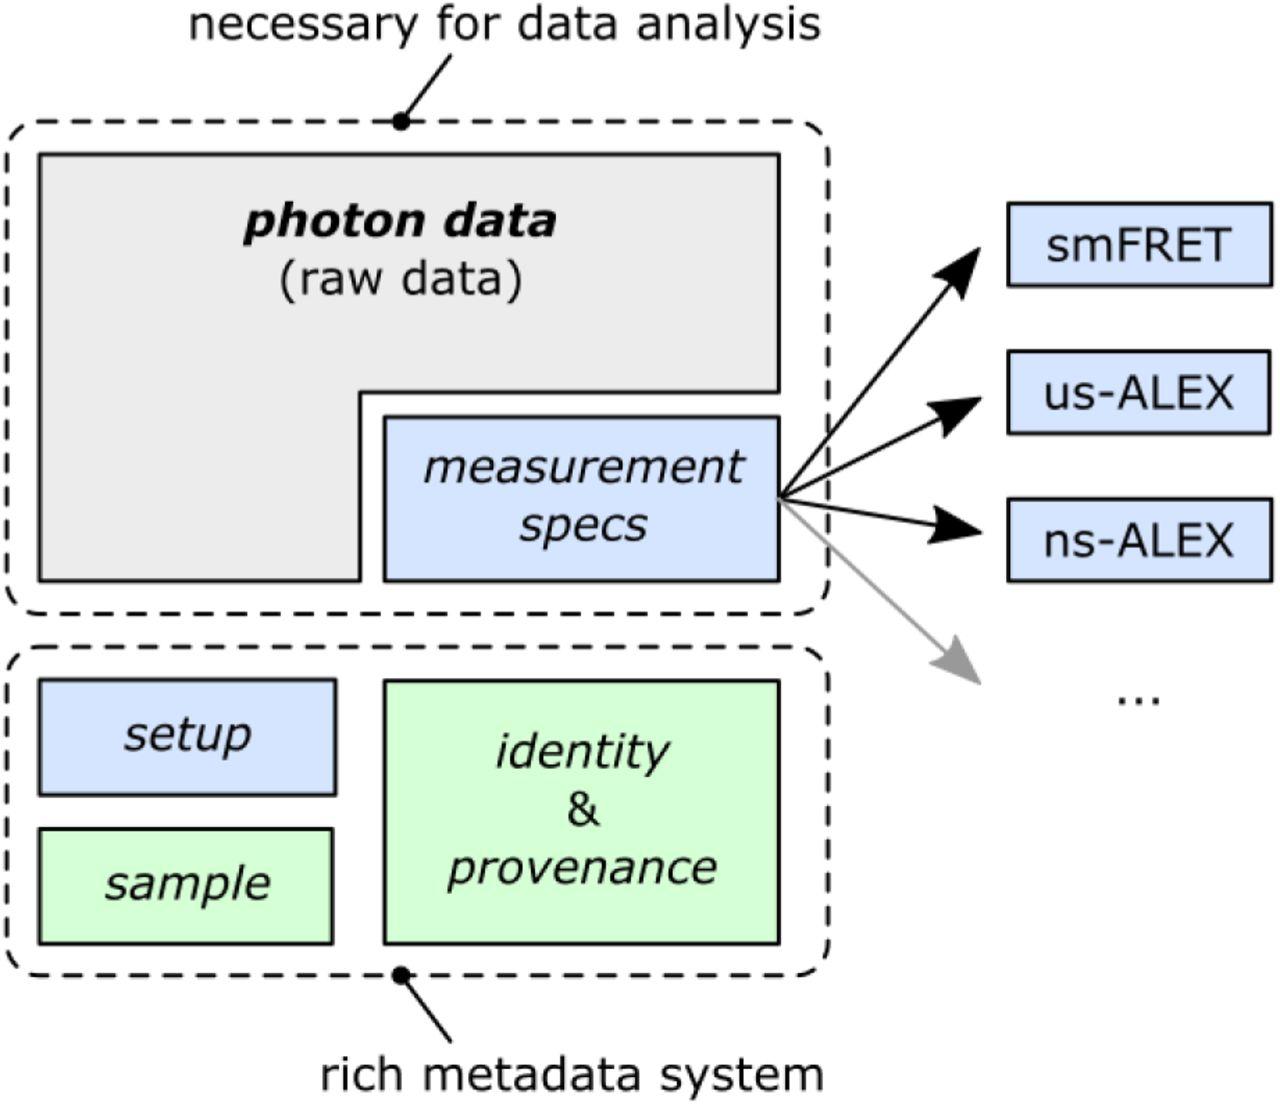 Photon-HDF5: an open file format for single-molecule